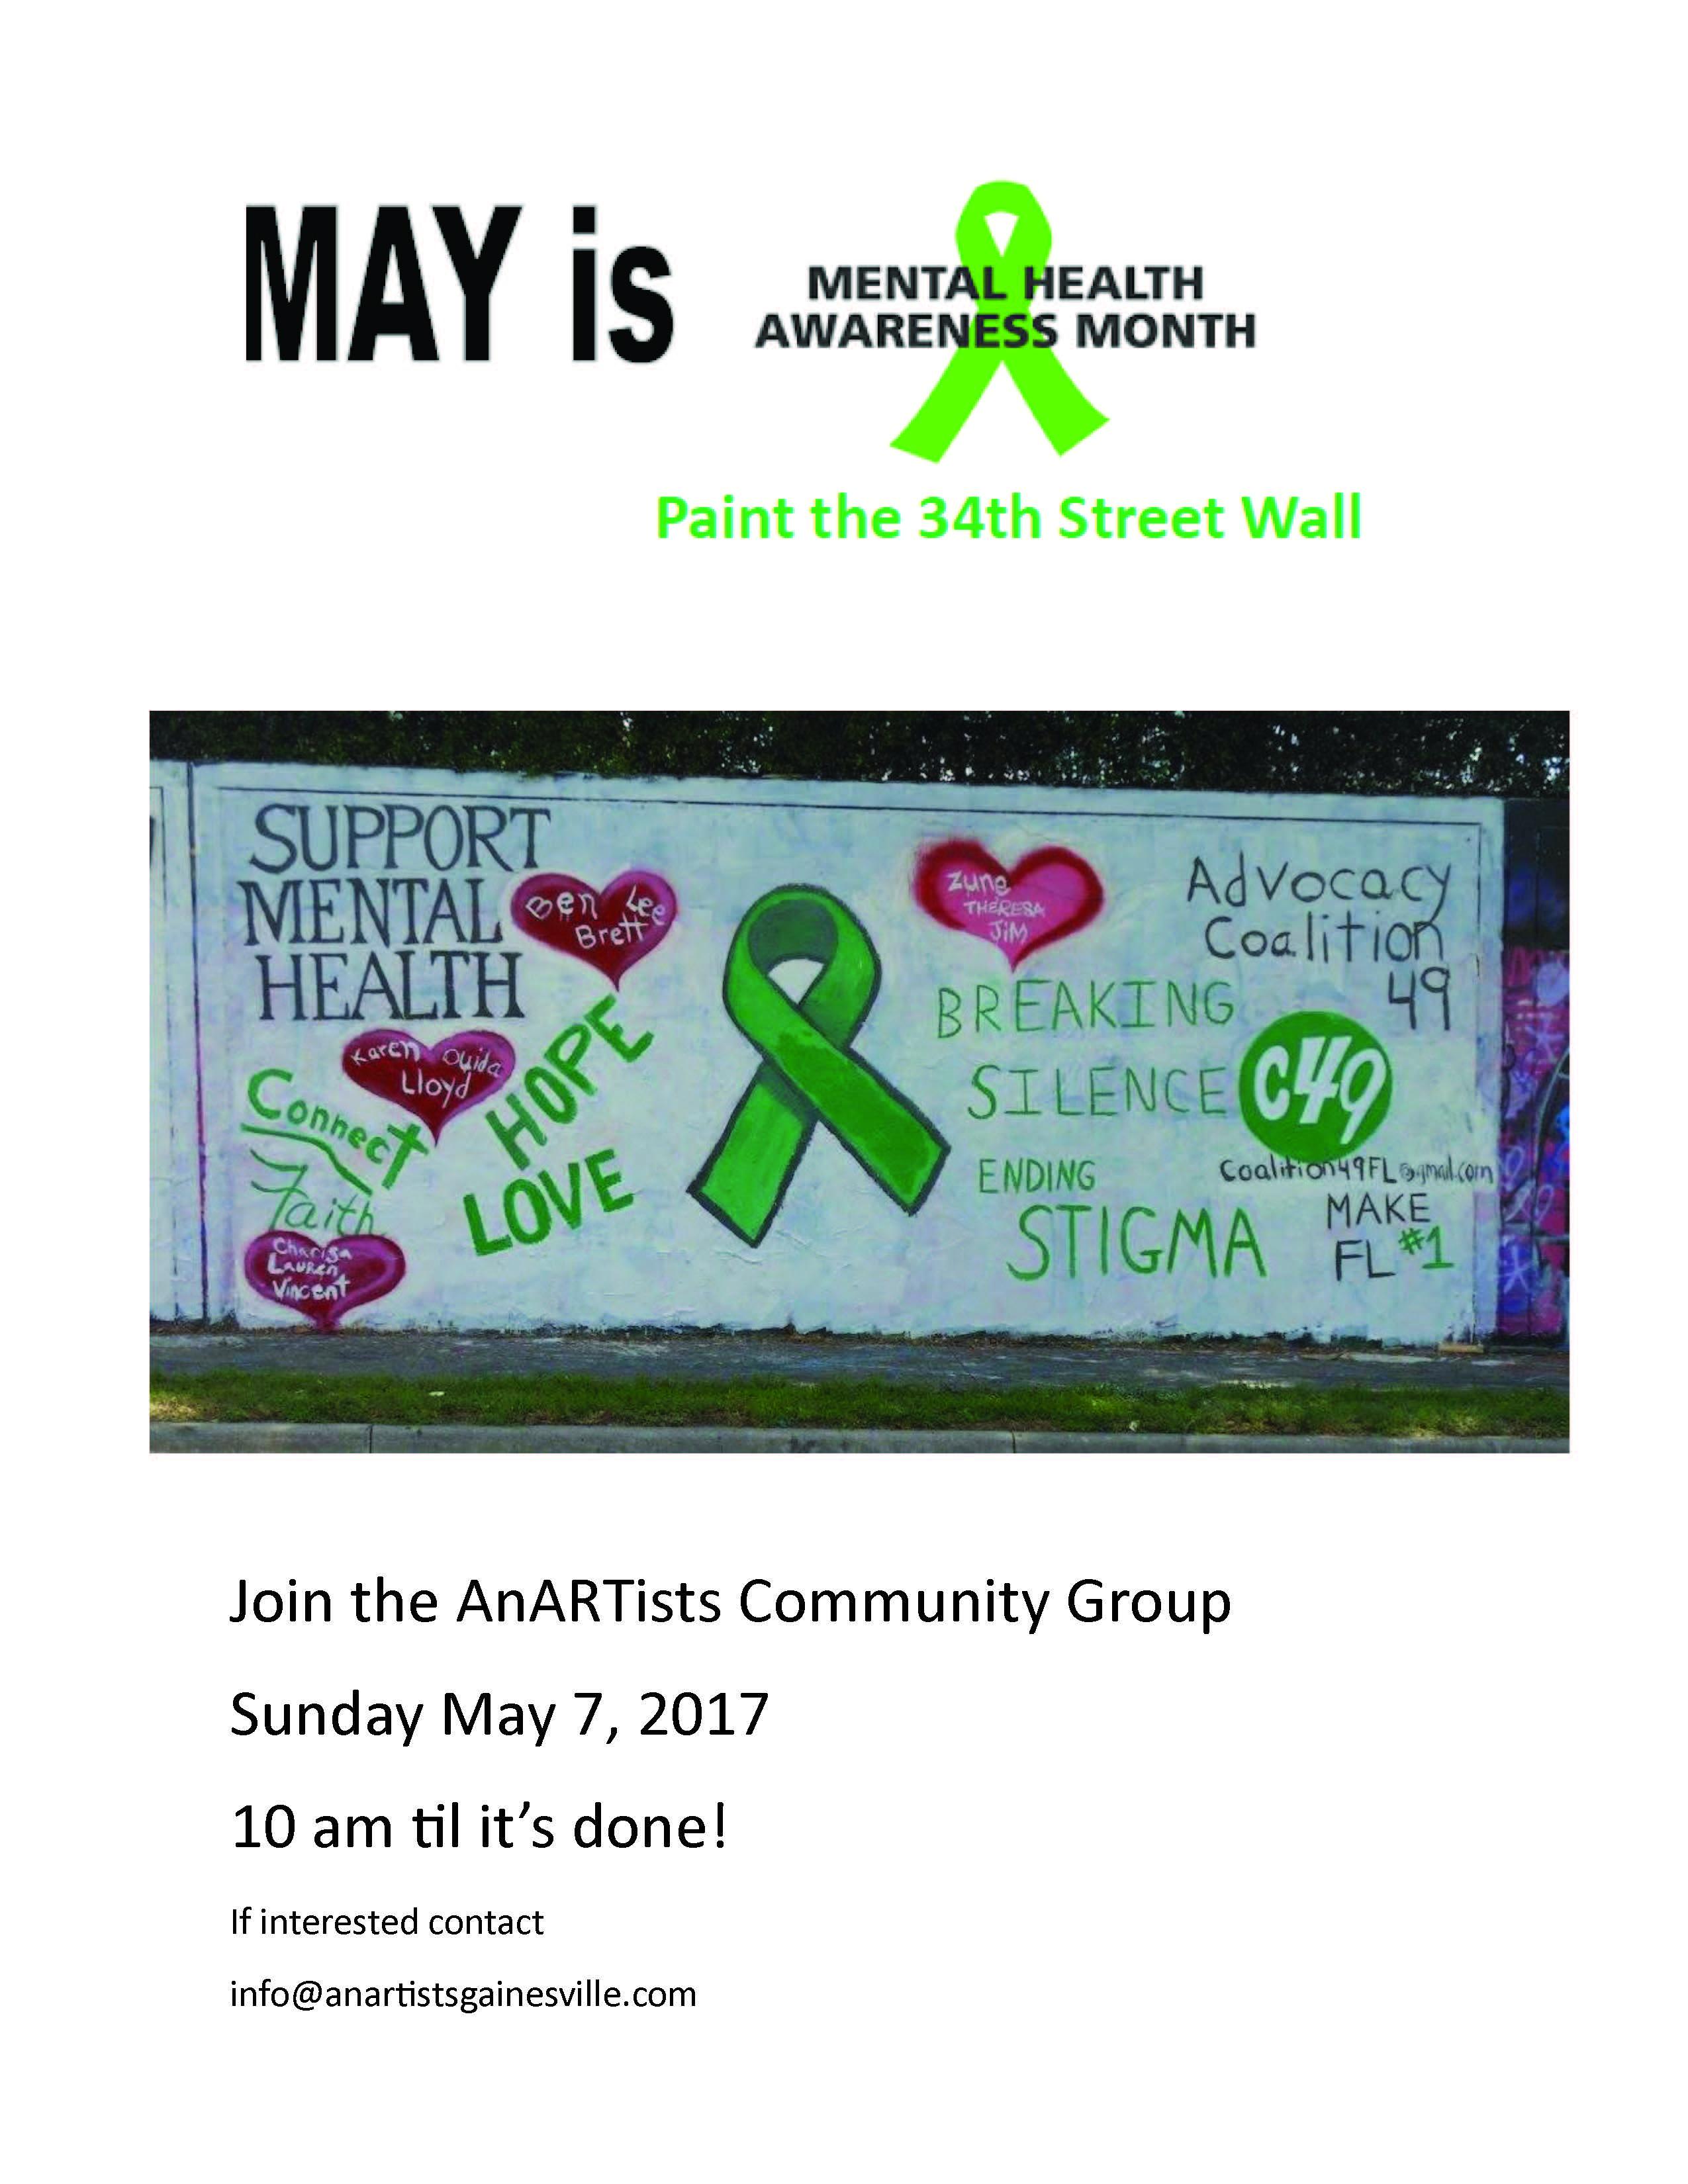 AnARTist Community Group